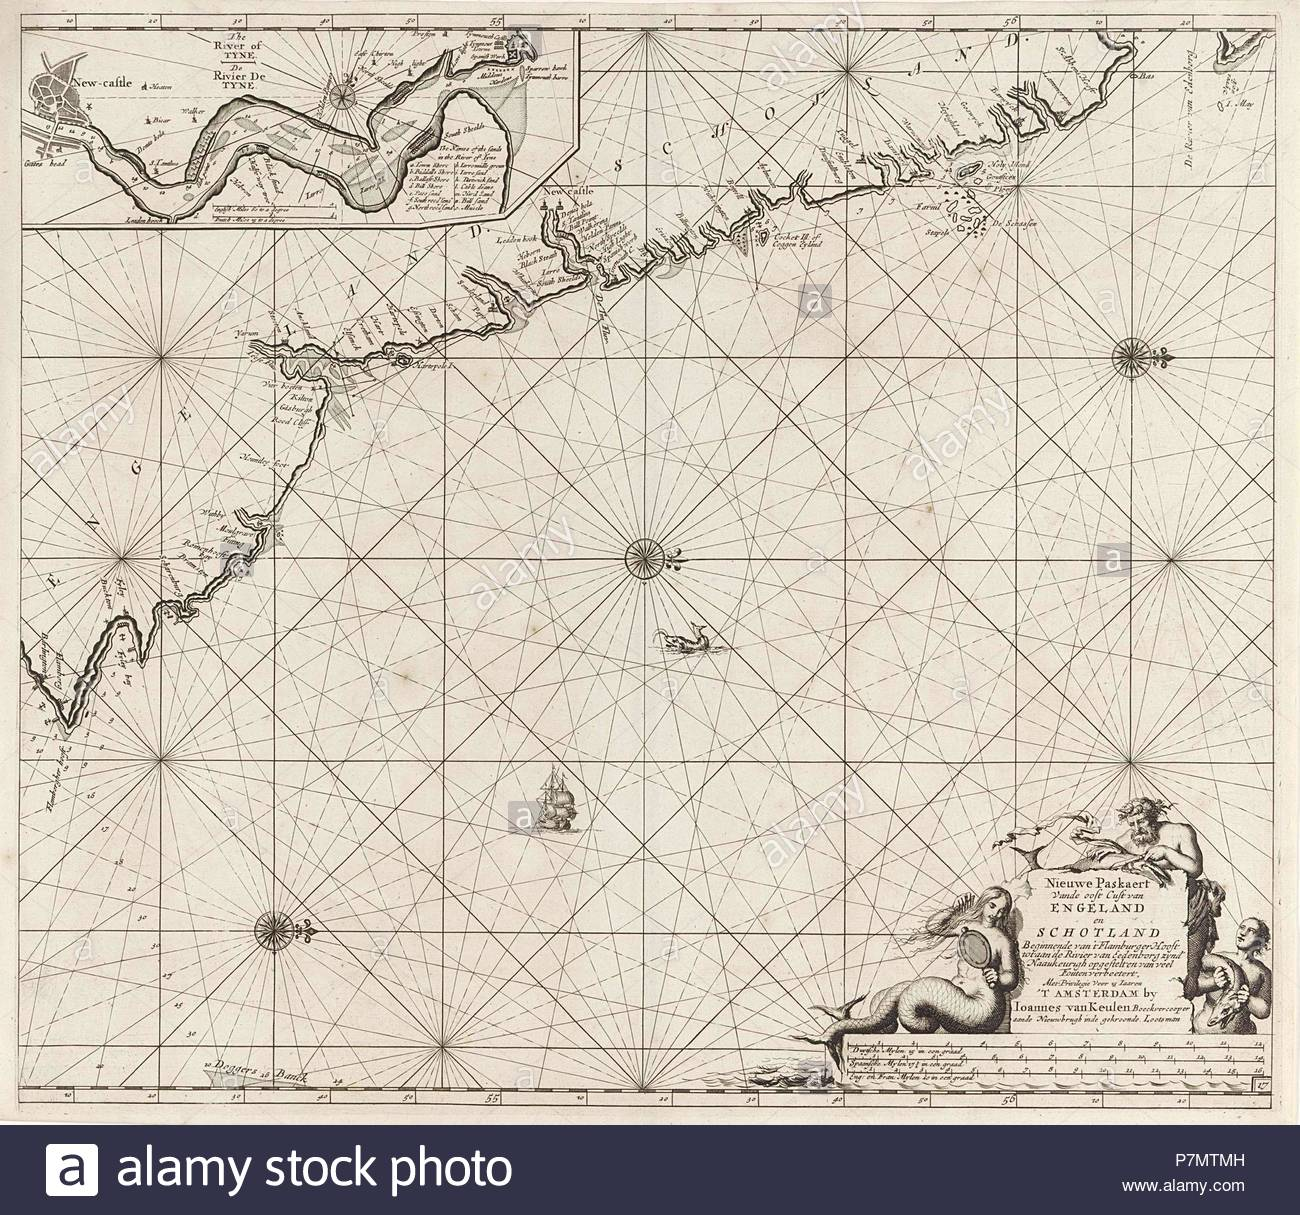 Sea chart of part of the northeast coast of England and part of Scotland, Jan Luyken, Johannes van Keulen (I), unknown, 1681 - 1799. - Stock Image